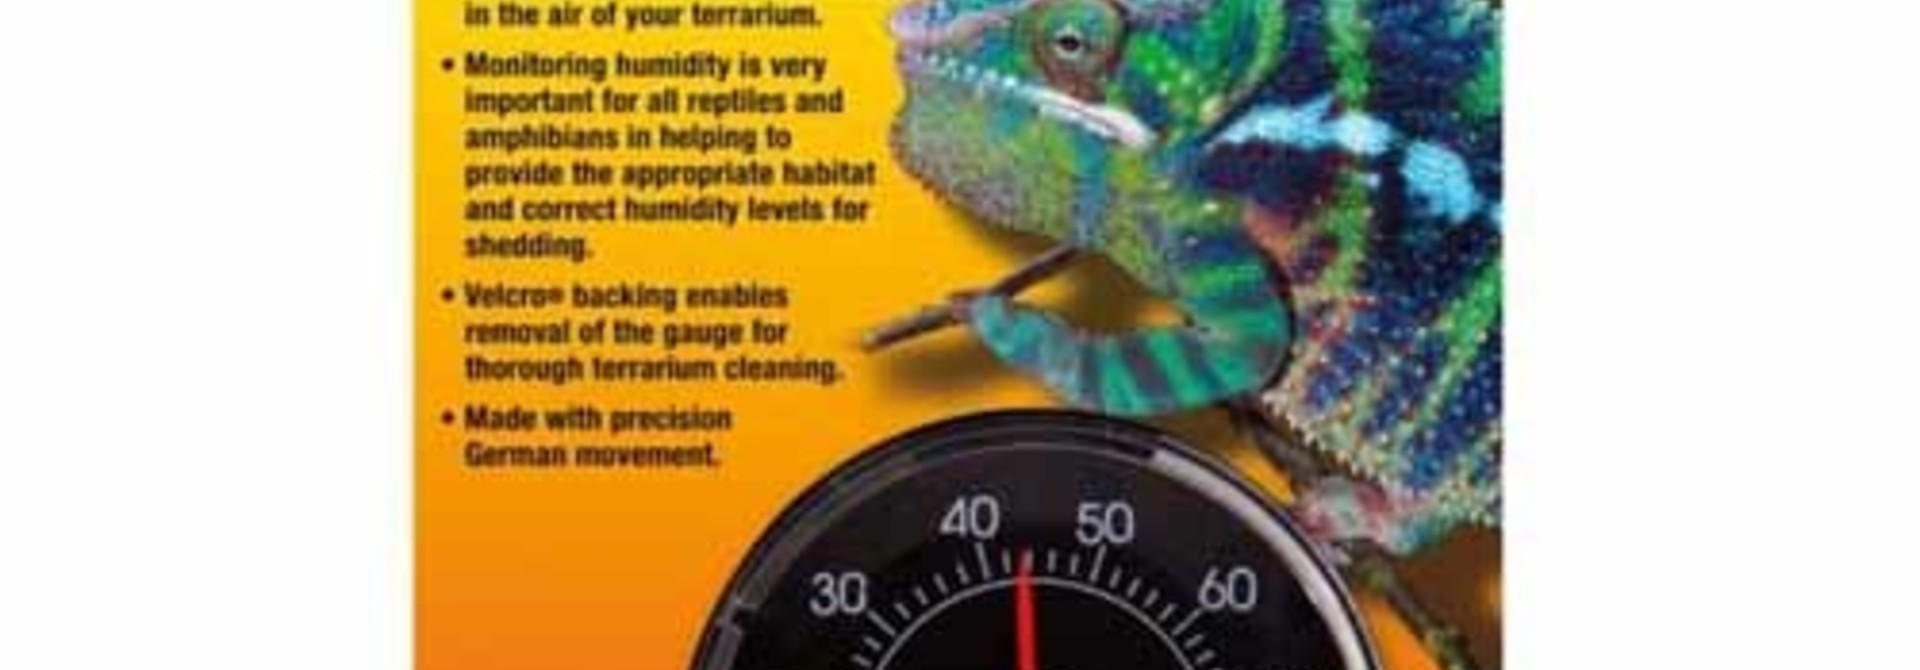 Analog Reptile Humidity Gauge